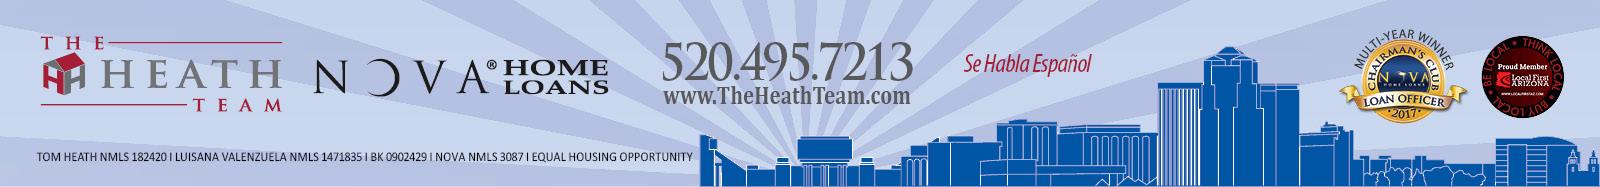 Heath Team Banner 1200x140.jpg